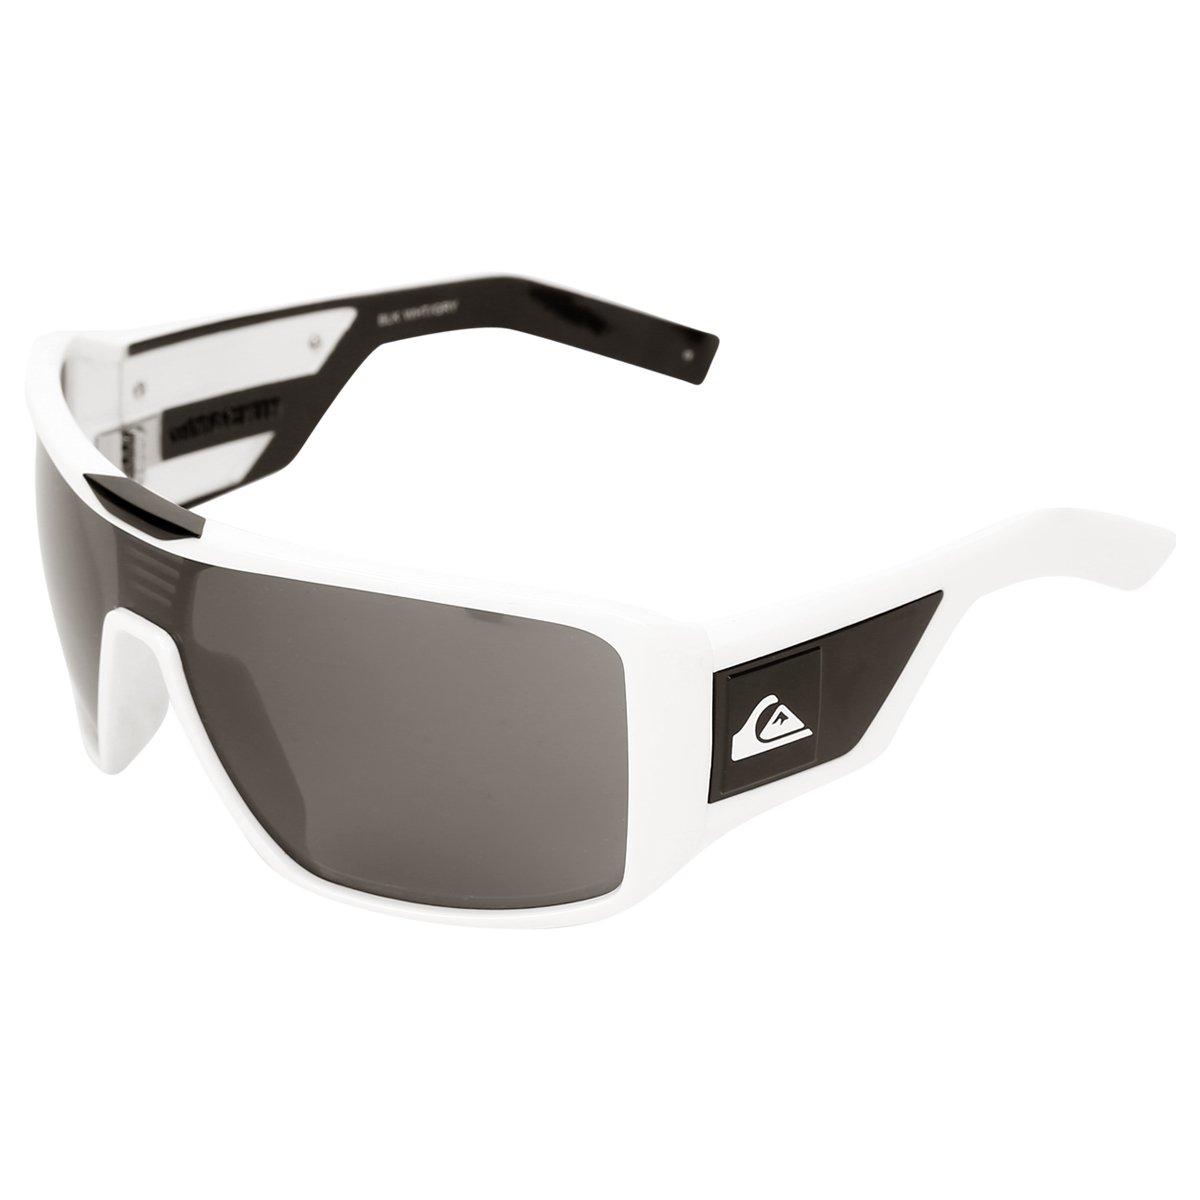 a21538454ca0b Óculos Quiksilver Mackin - Compre Agora   Netshoes